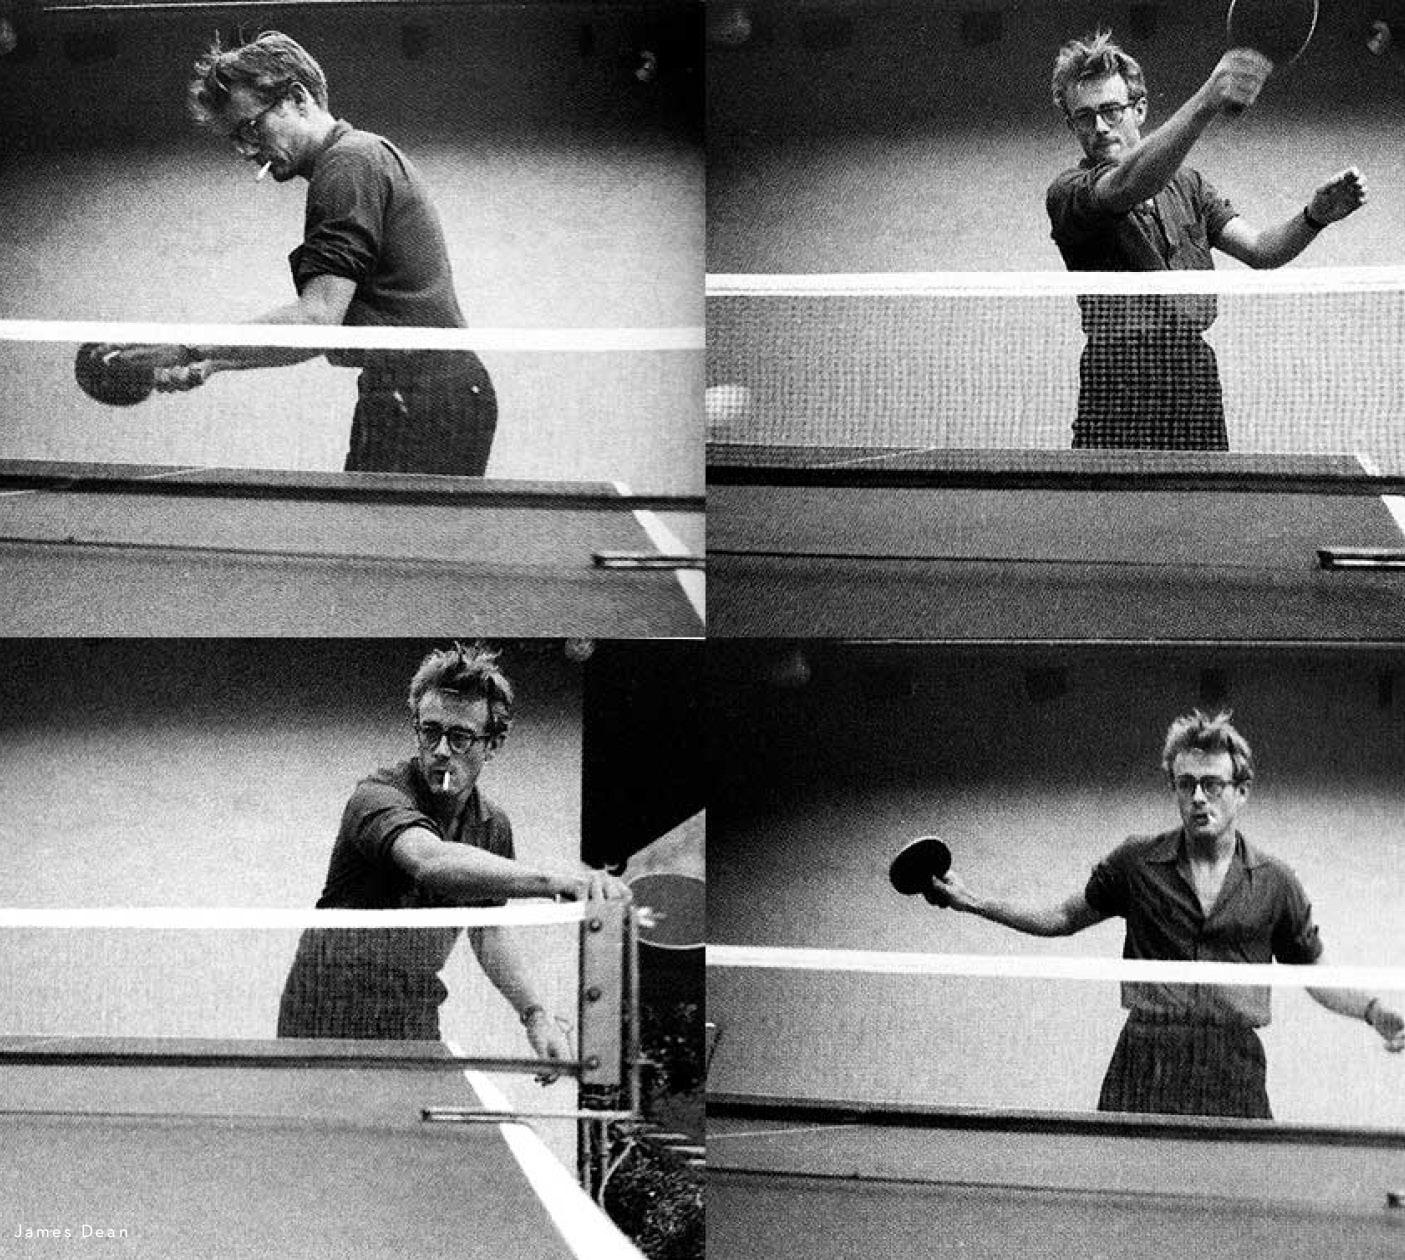 James Dean Playing Ping Pong